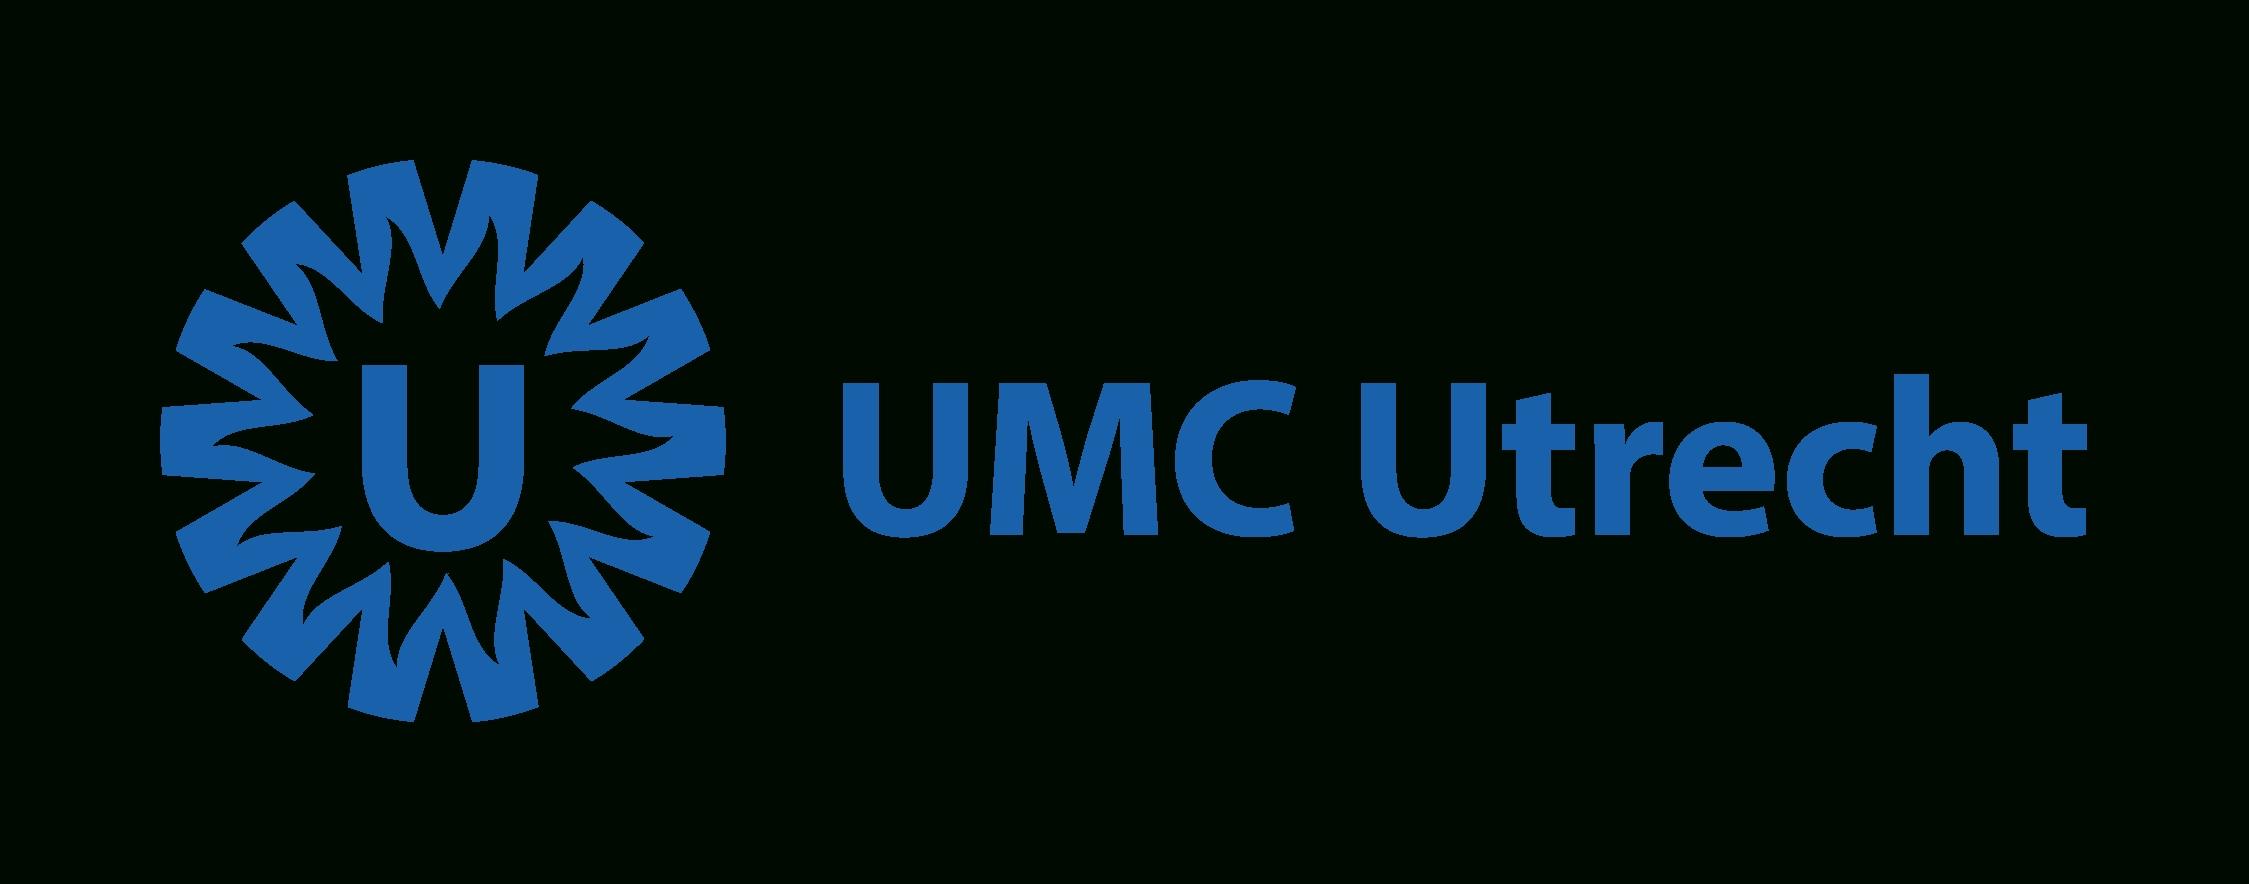 Postdoc In Tumor Immunology, Umc Utrecht - Utrecht  Umc